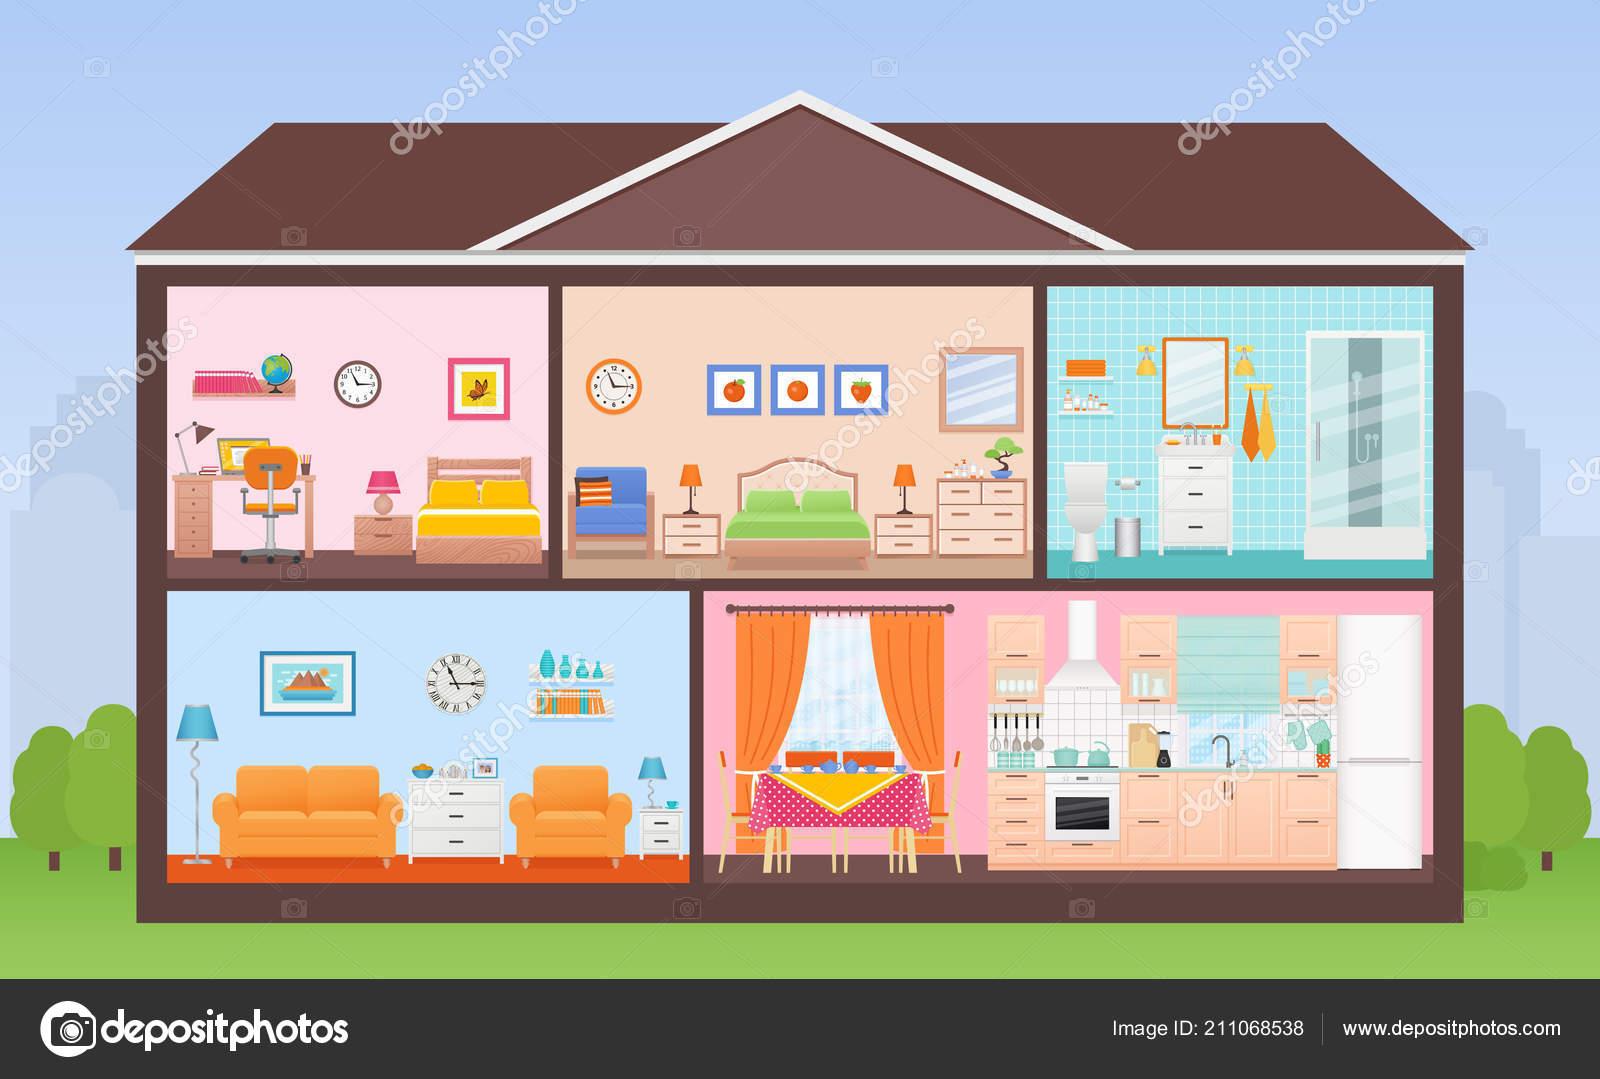 c4156995b9ea Εσωτερικό του σπιτιού. Διάνυσμα. Σπίτι στην περικοπή. Διατομή με δωμάτια  υπνοδωμάτιο